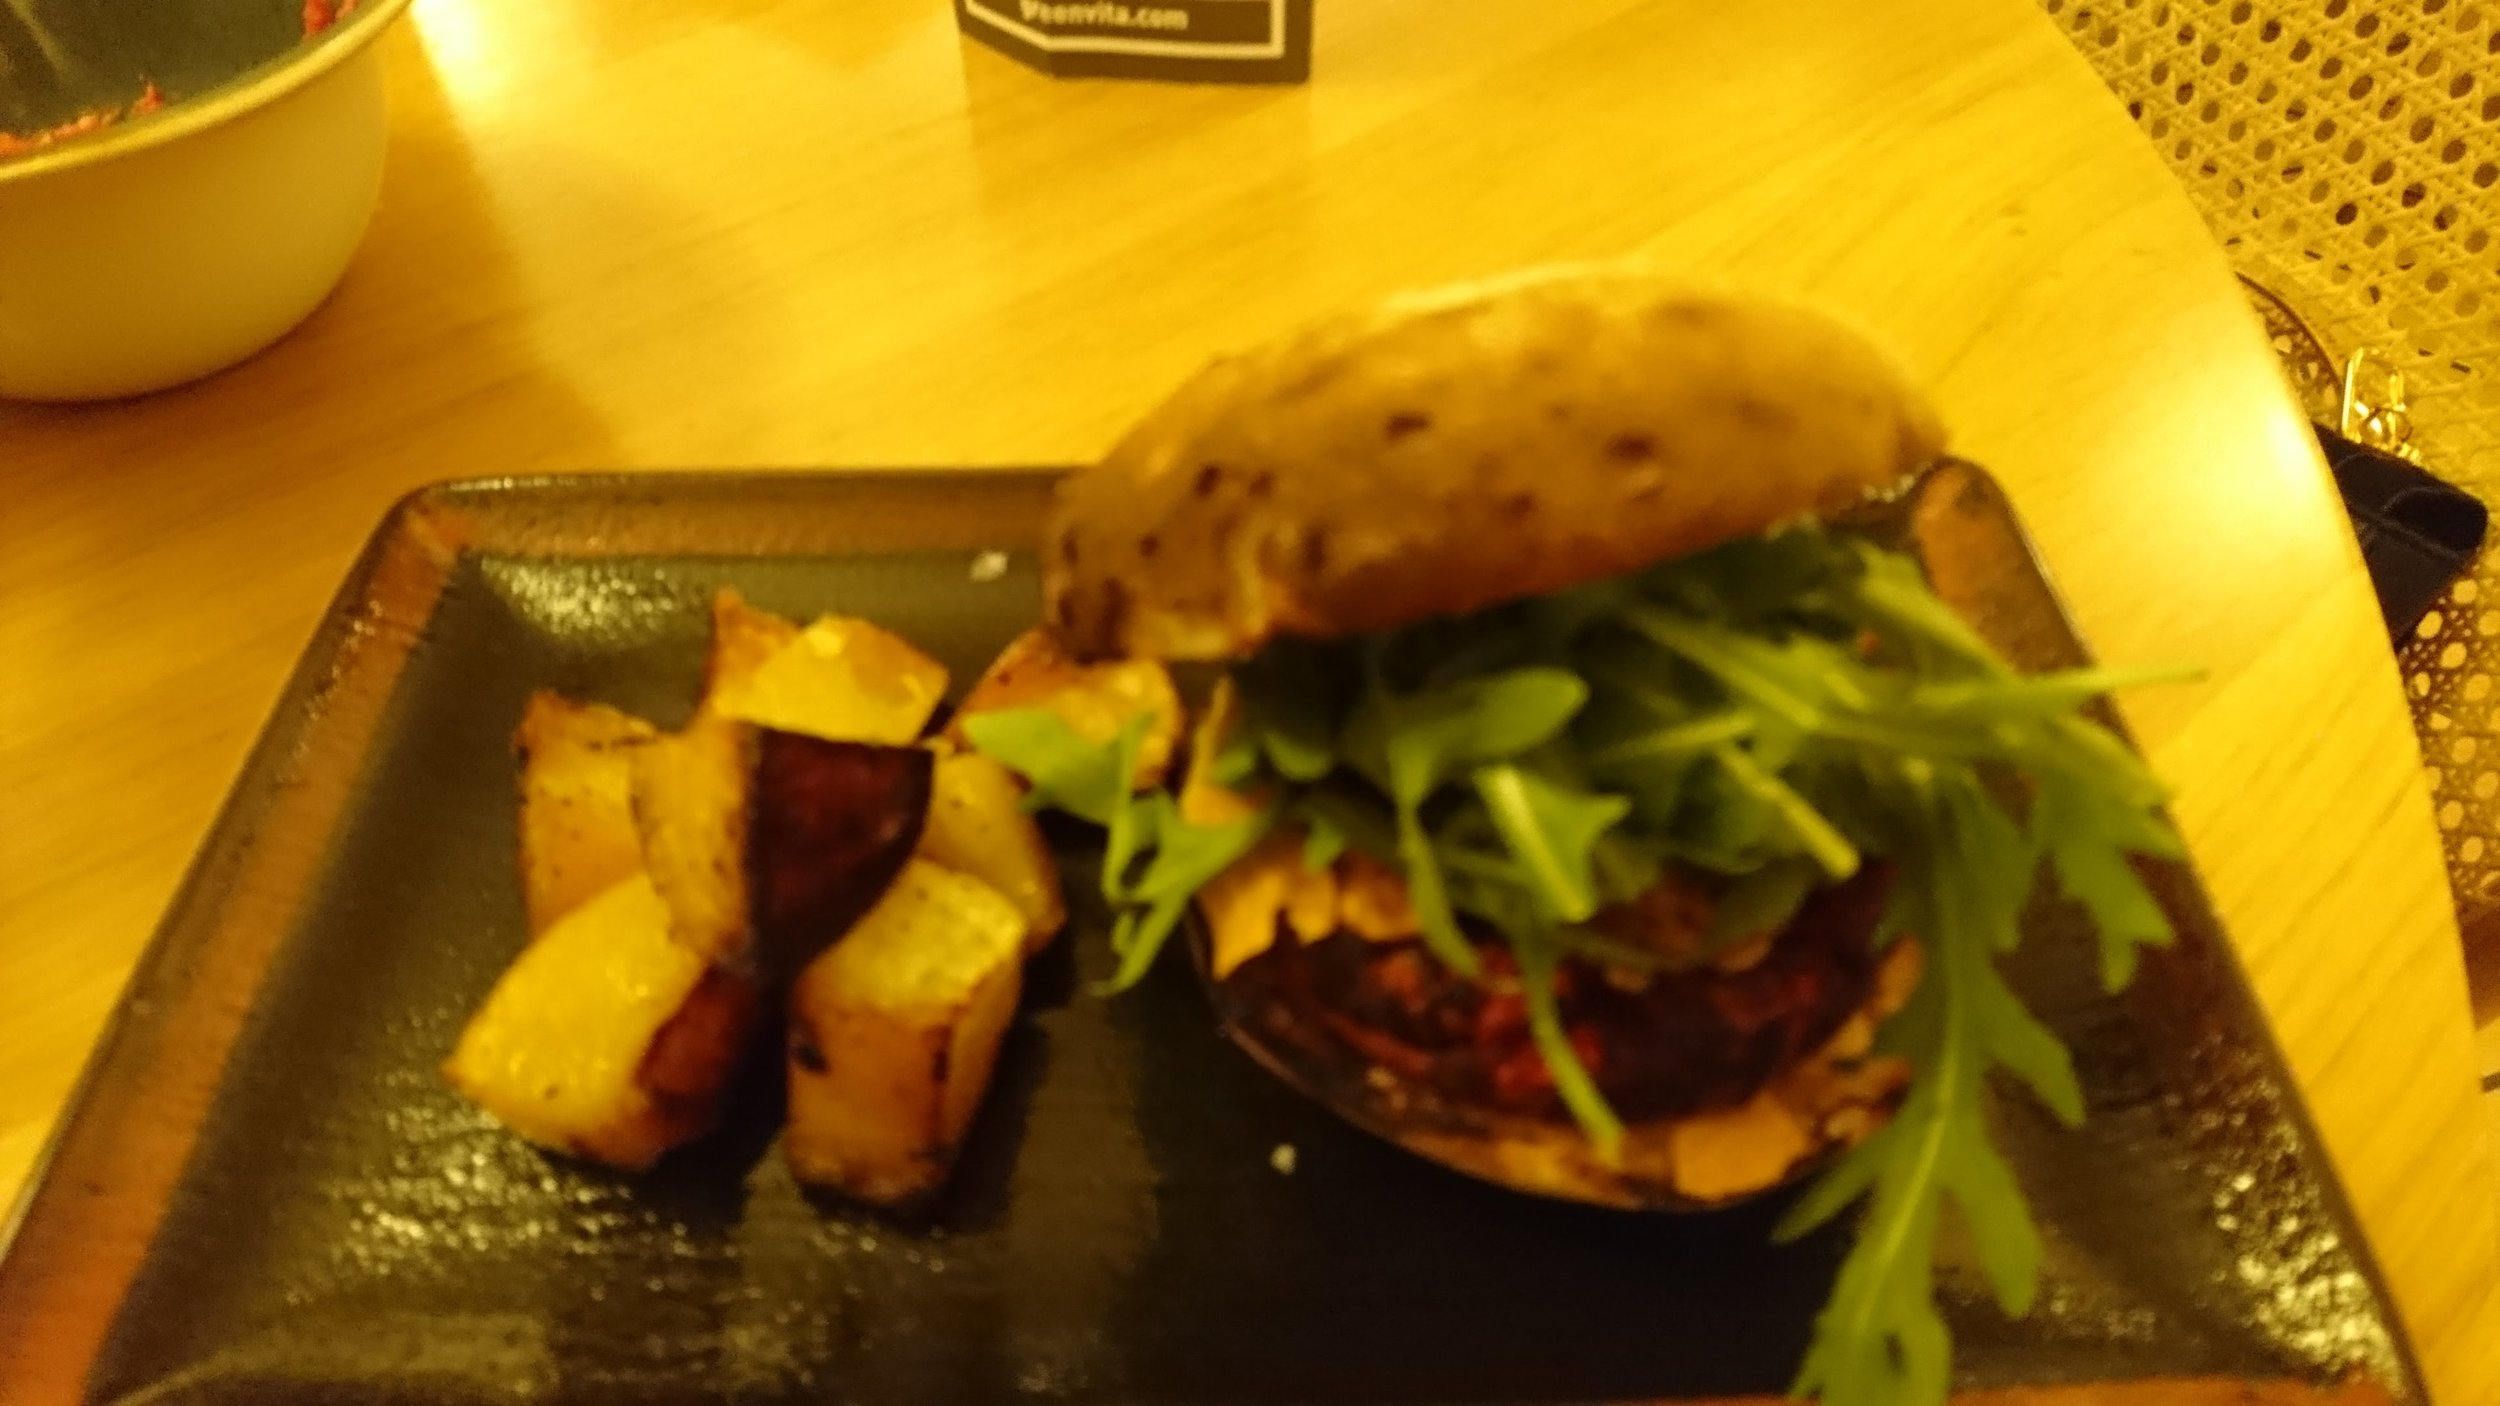 Green Vita Red Burger